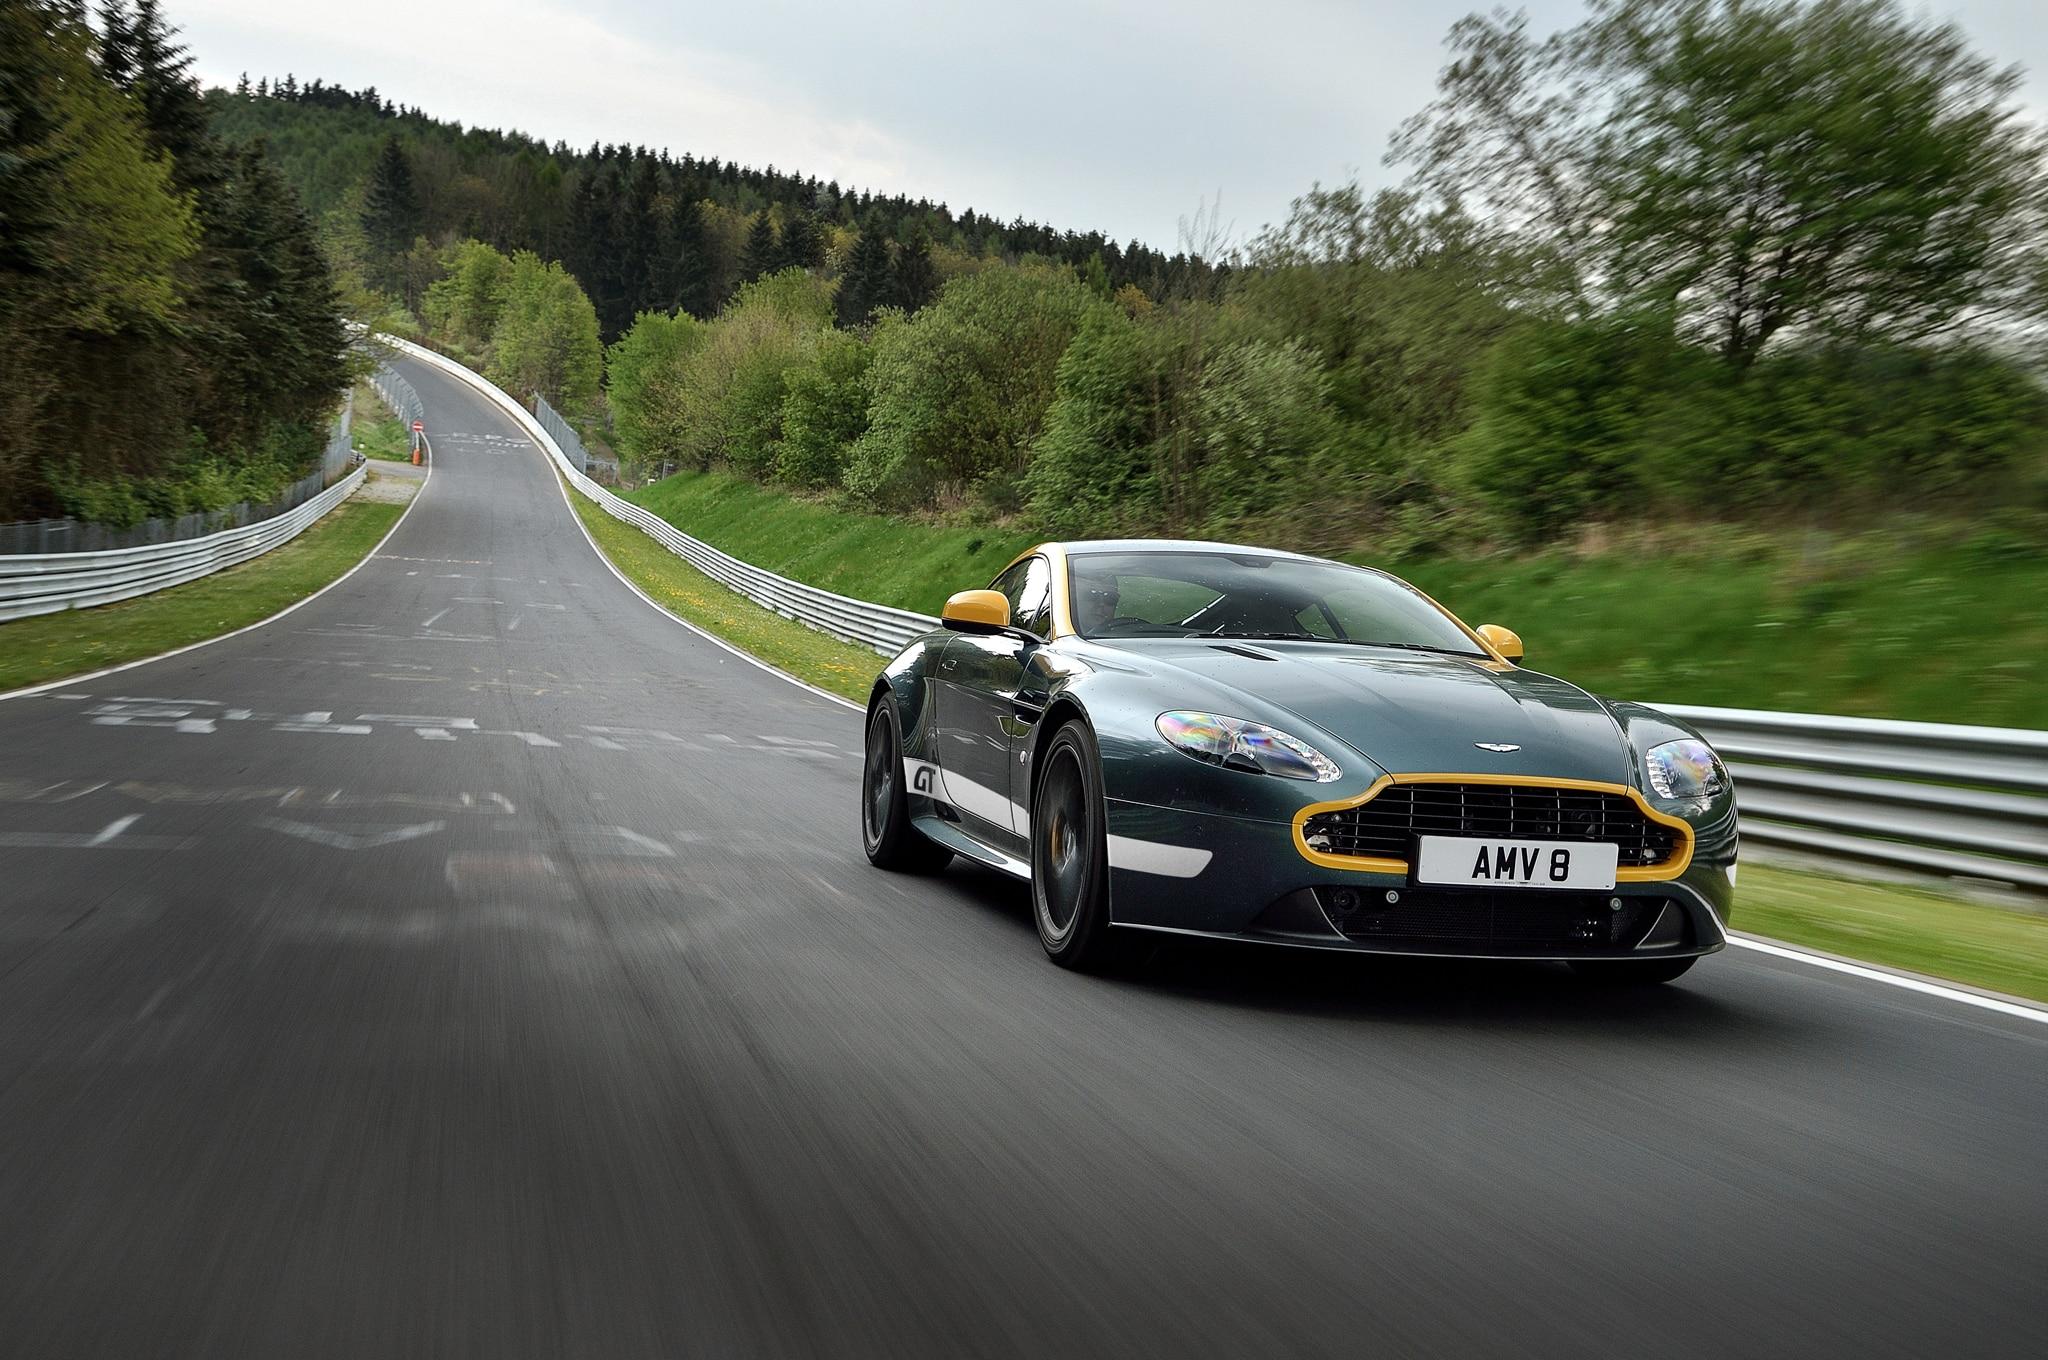 2015 aston martin v8 vantage gt review - automobile magazine